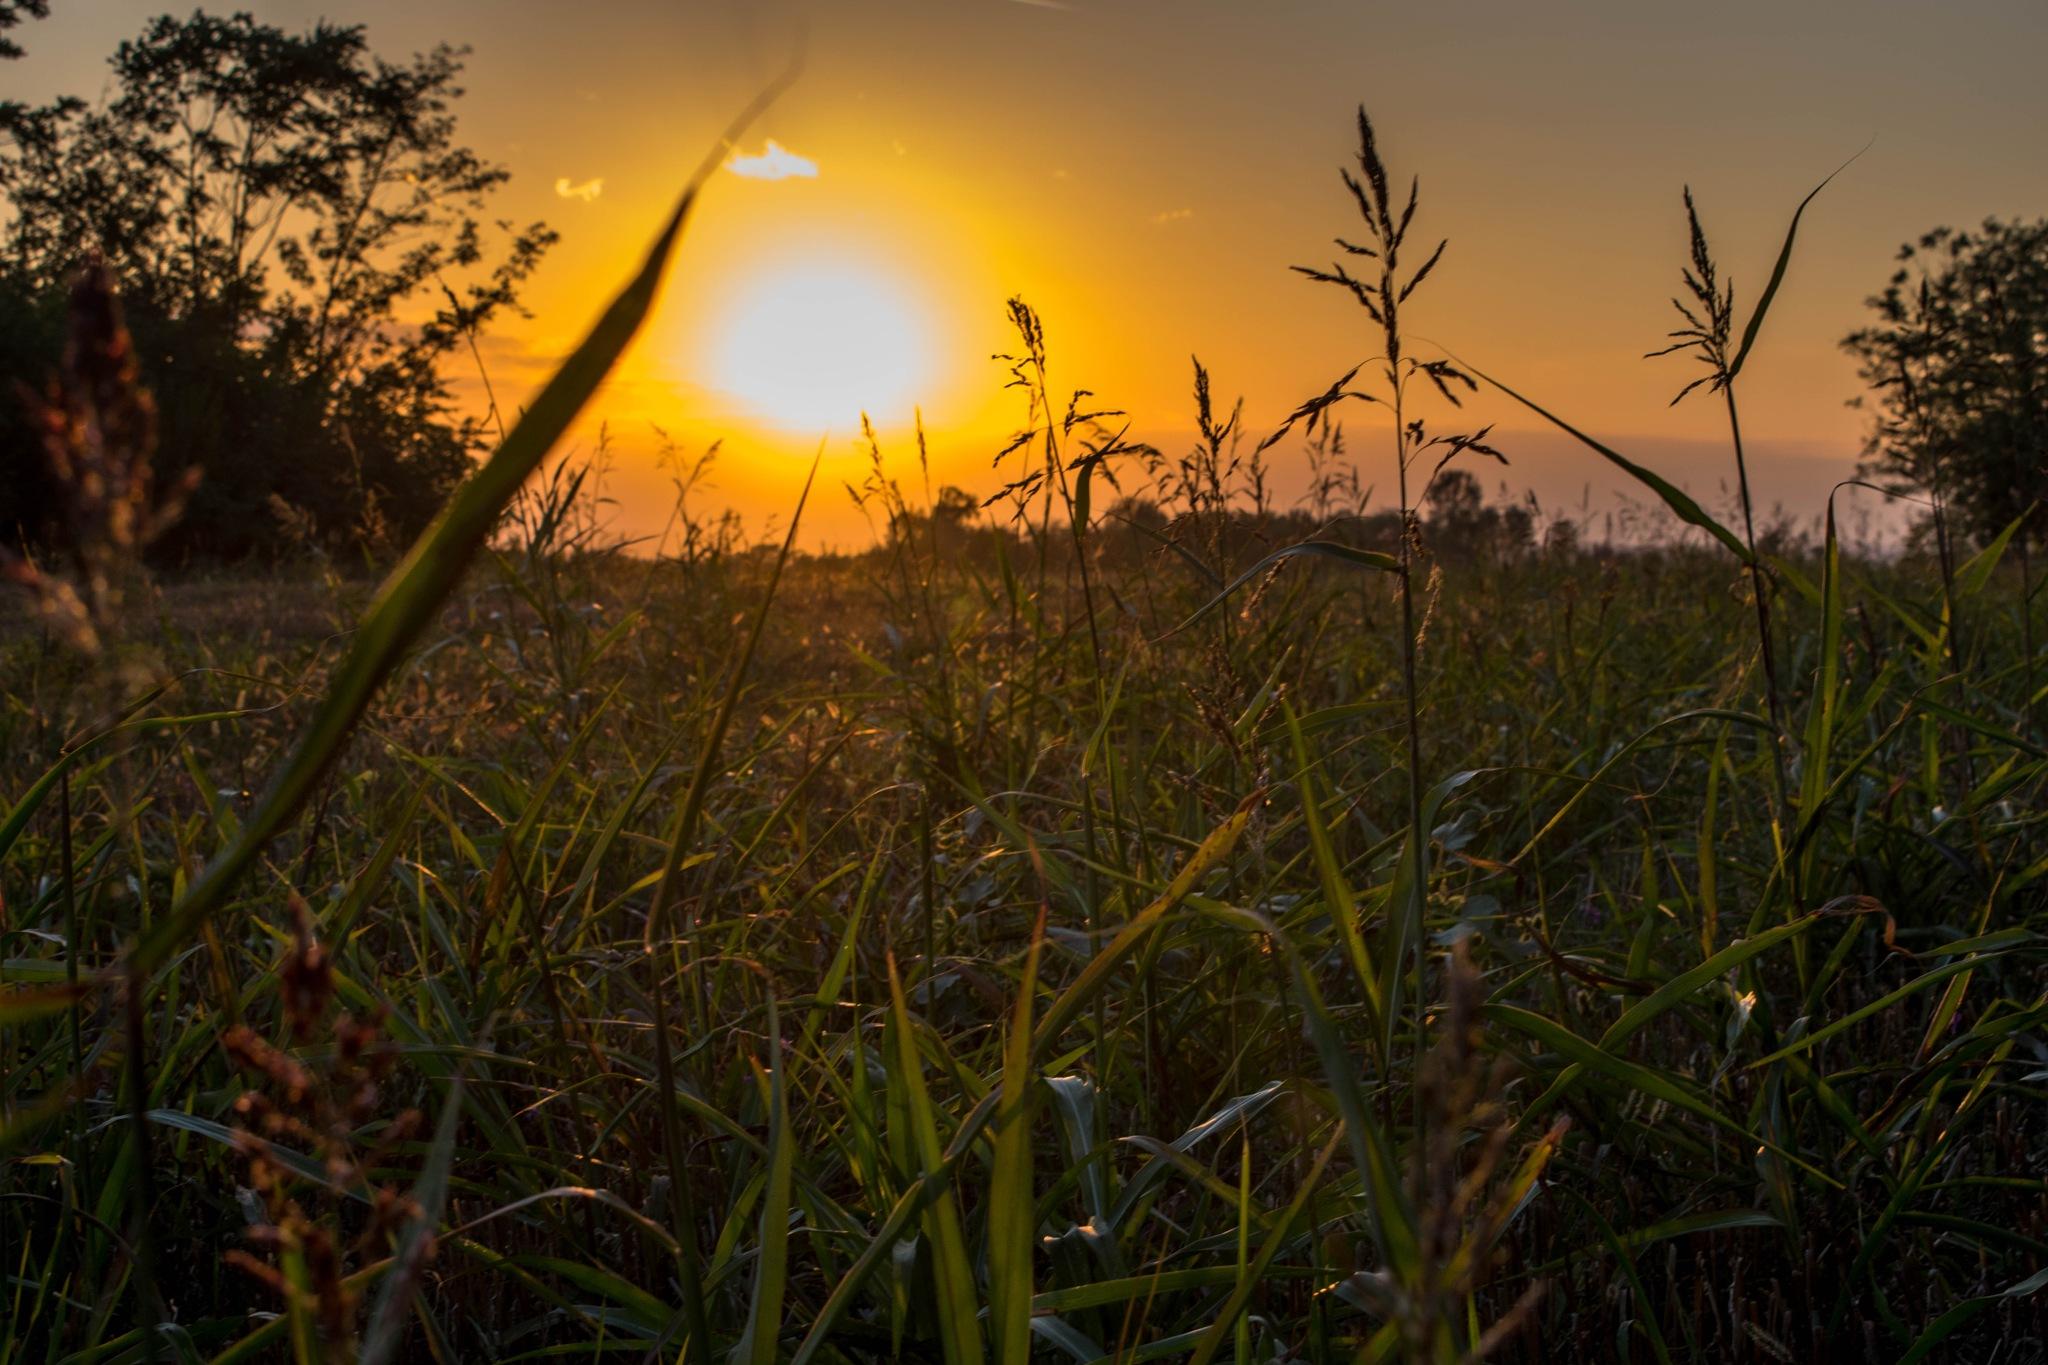 sunset by thecwazy